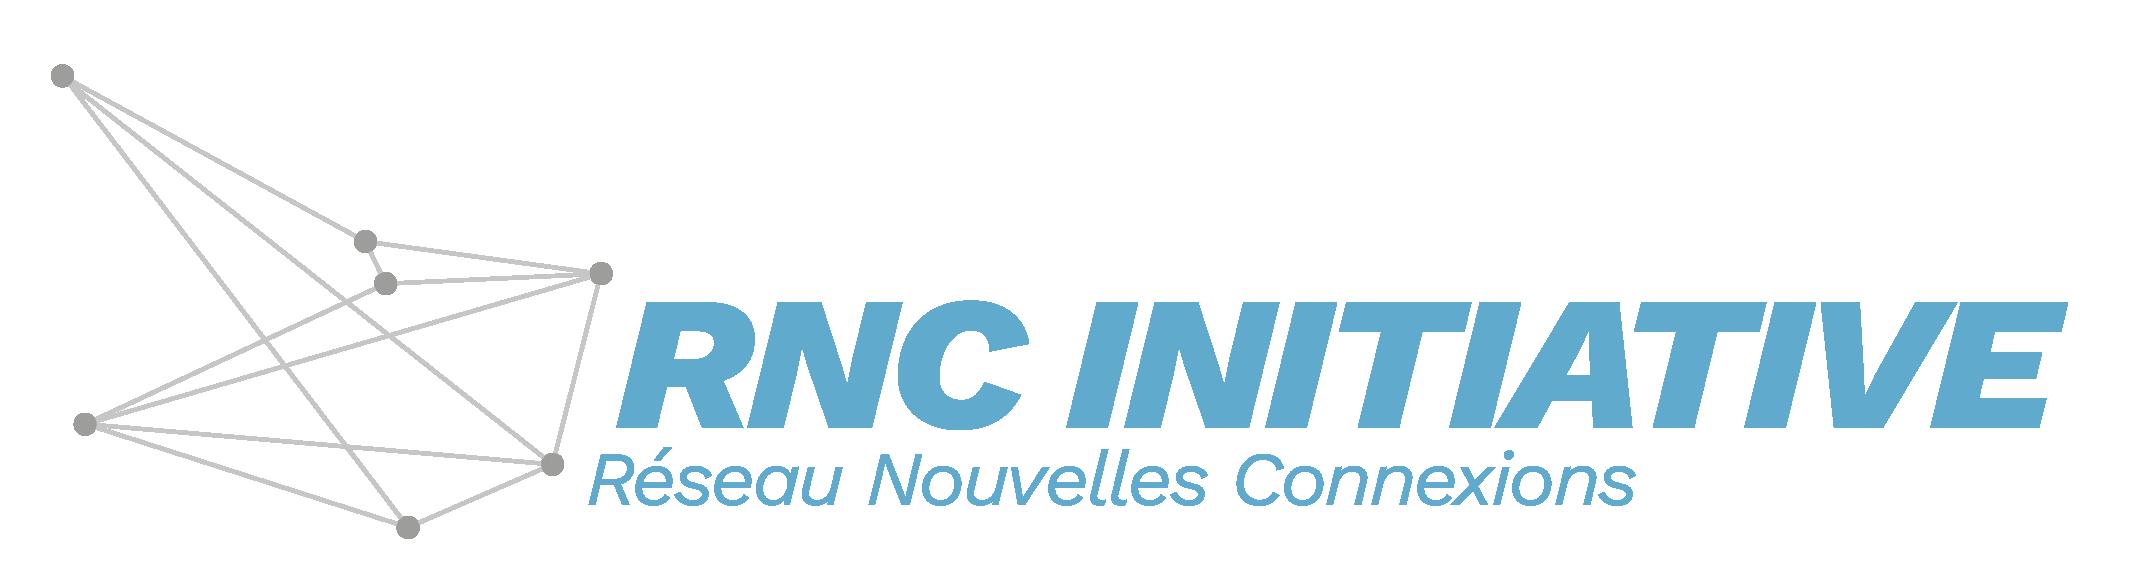 RNC initiatives